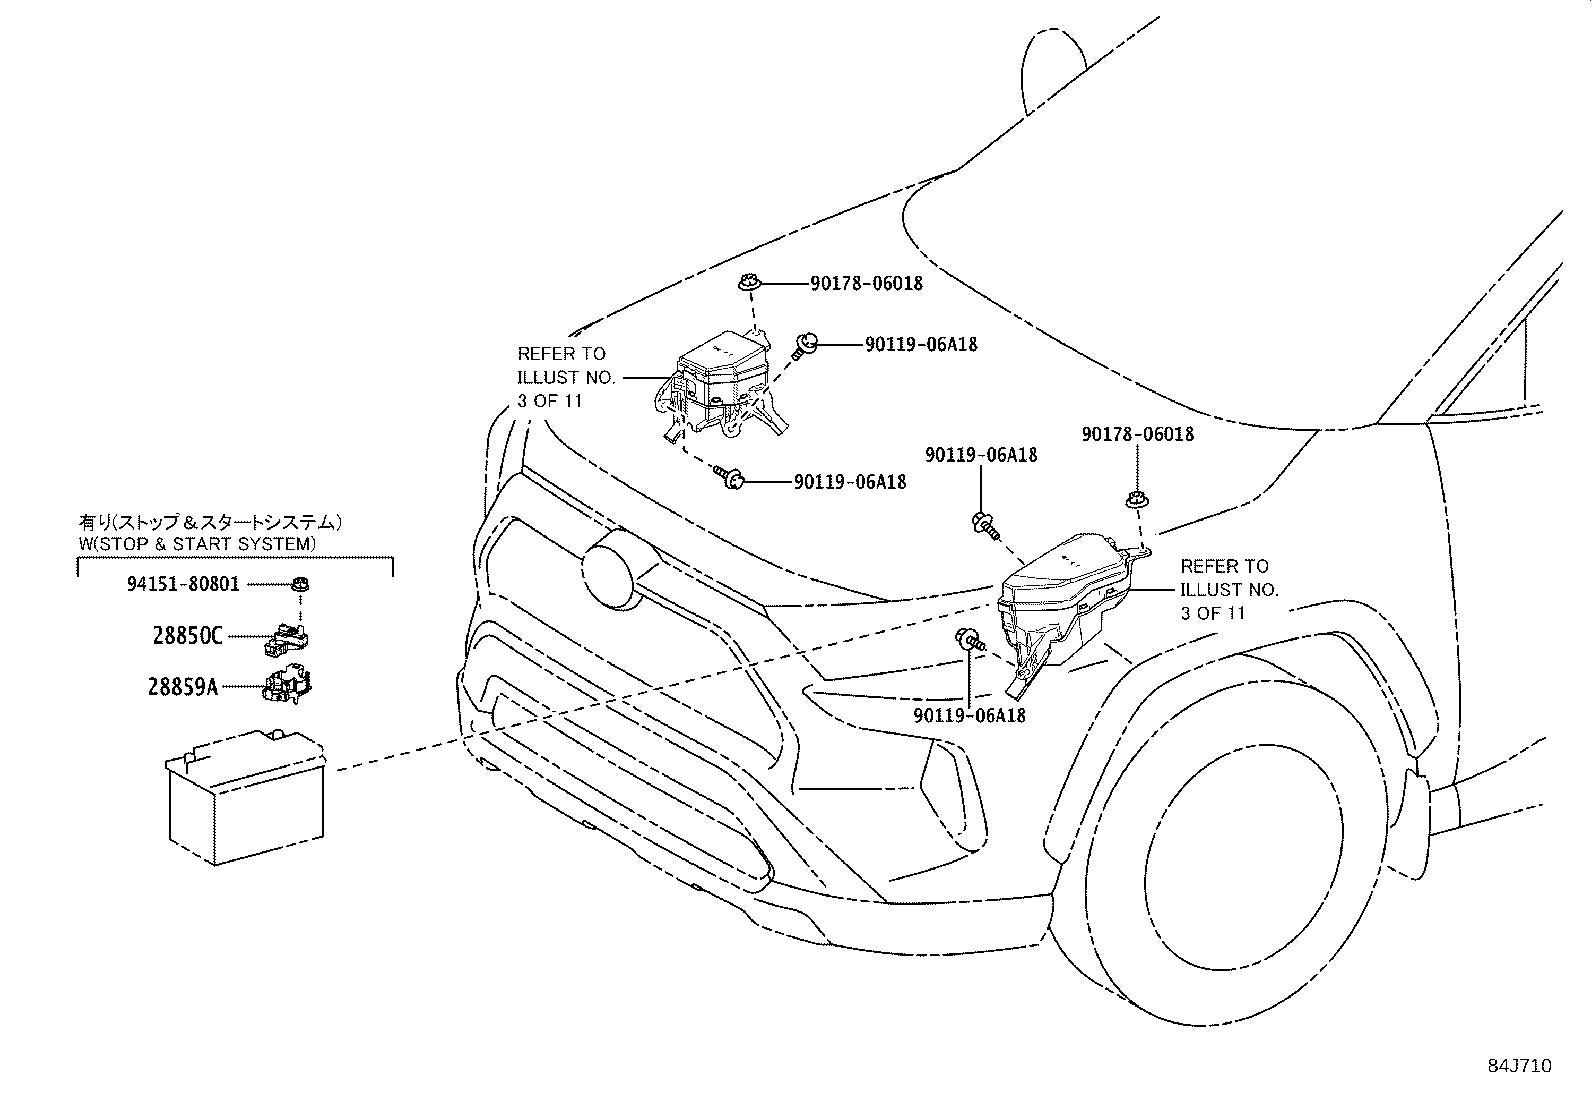 Toyota Rav4 Gage Assembly Fuel Sender No 2 Engine